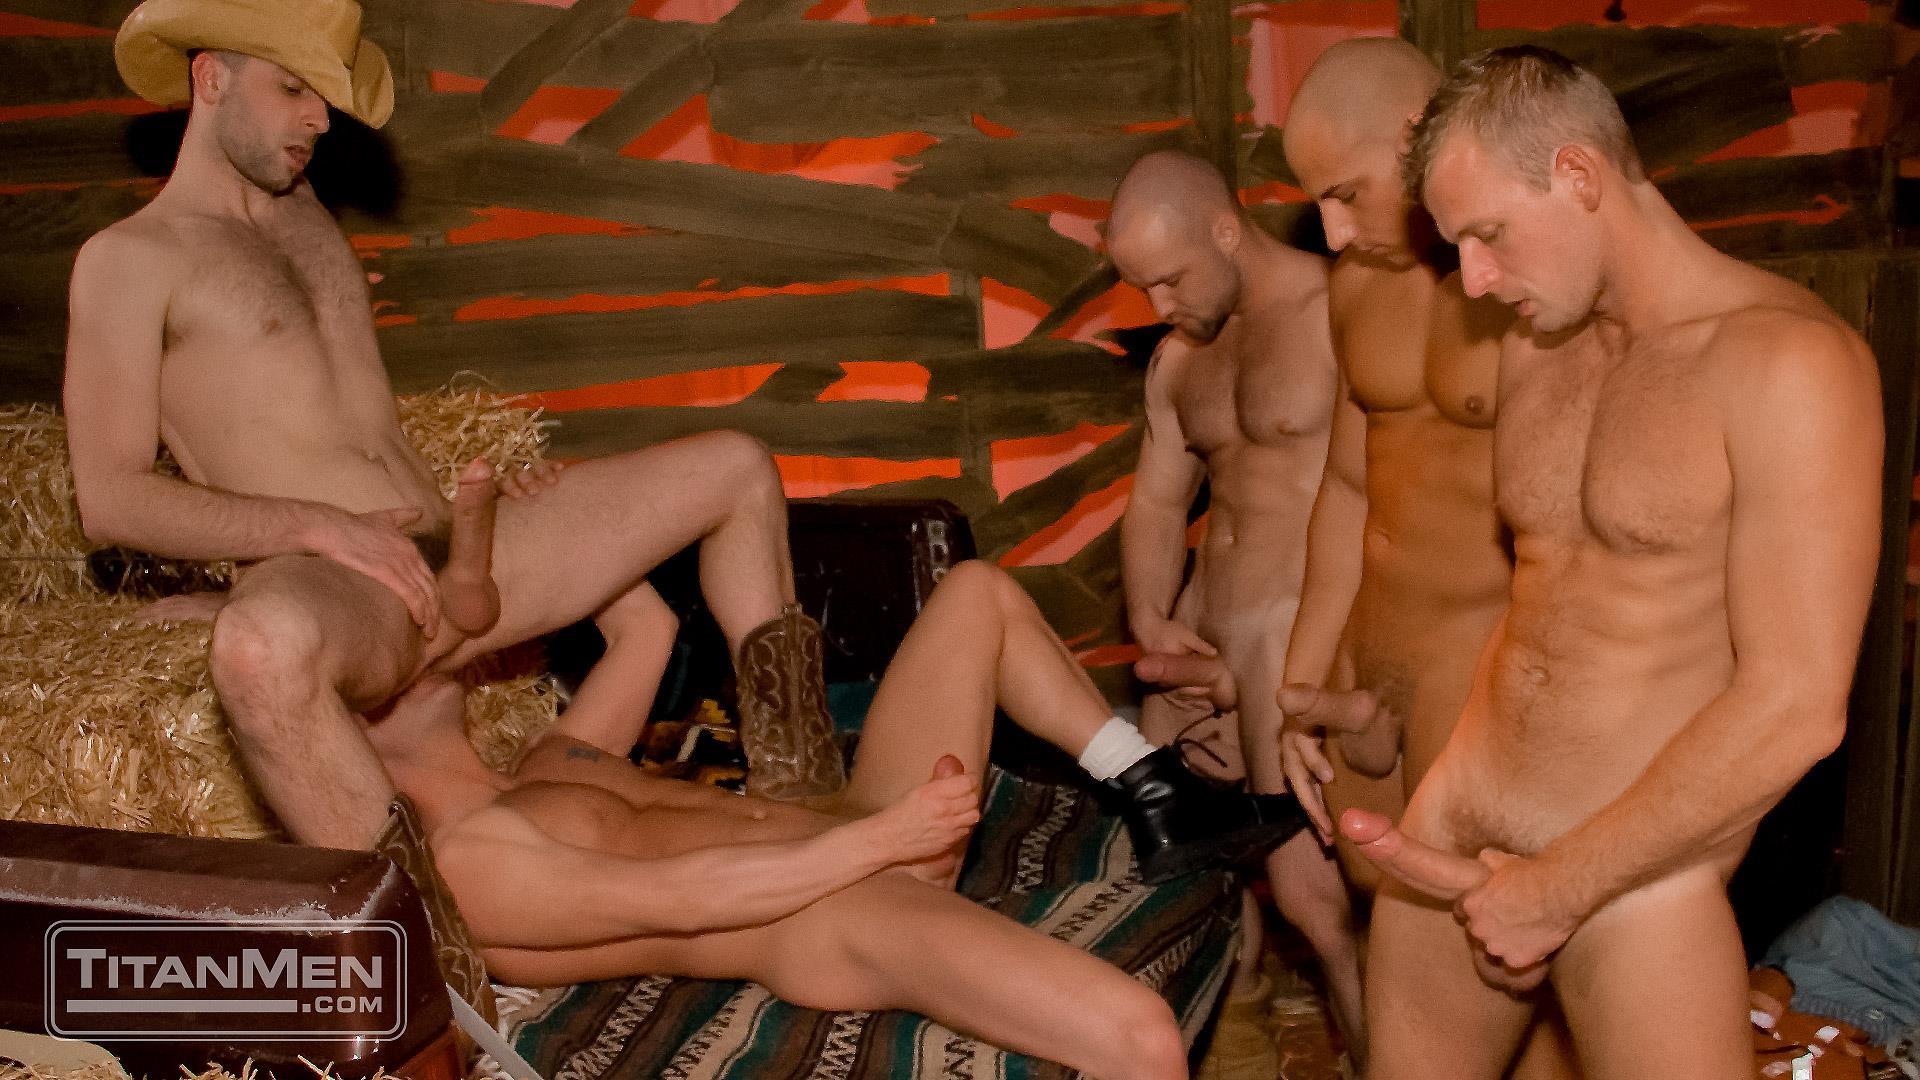 TitanMen-Joe-Gage-Rednecks-With-Big-Cocks-Amateur-Gay-Porn-34 Big Cock Rednecks From TitanMen and Joe Gage